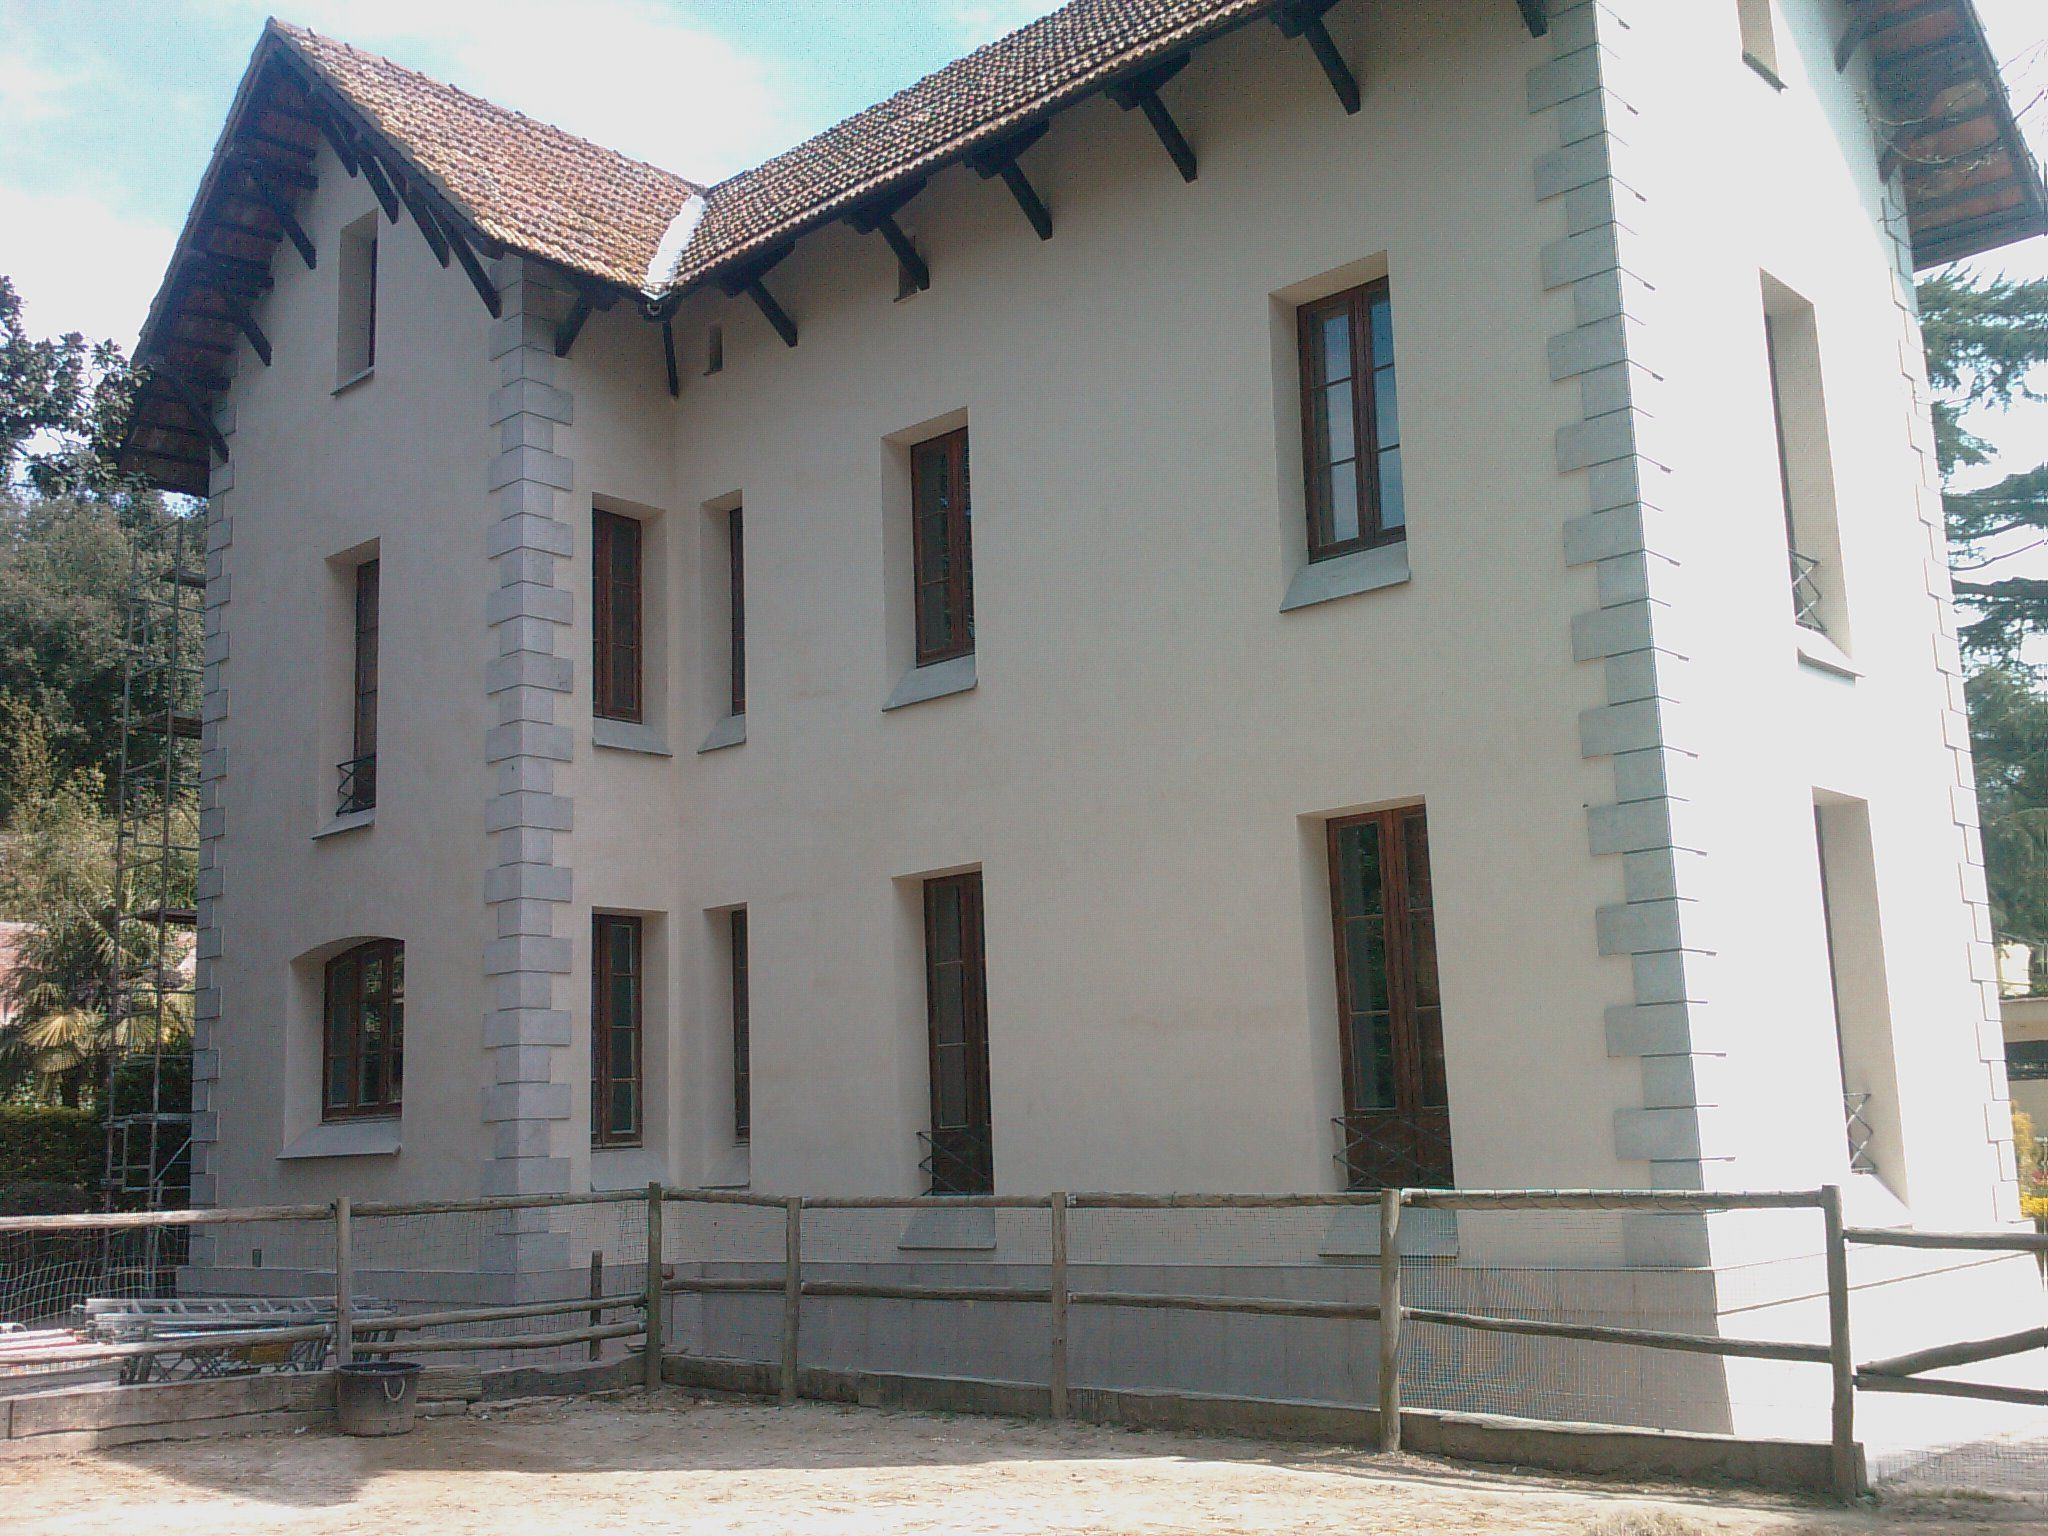 Casa martinez vallromanes fachada mixta con piedra - Fachadas de casas con piedra ...